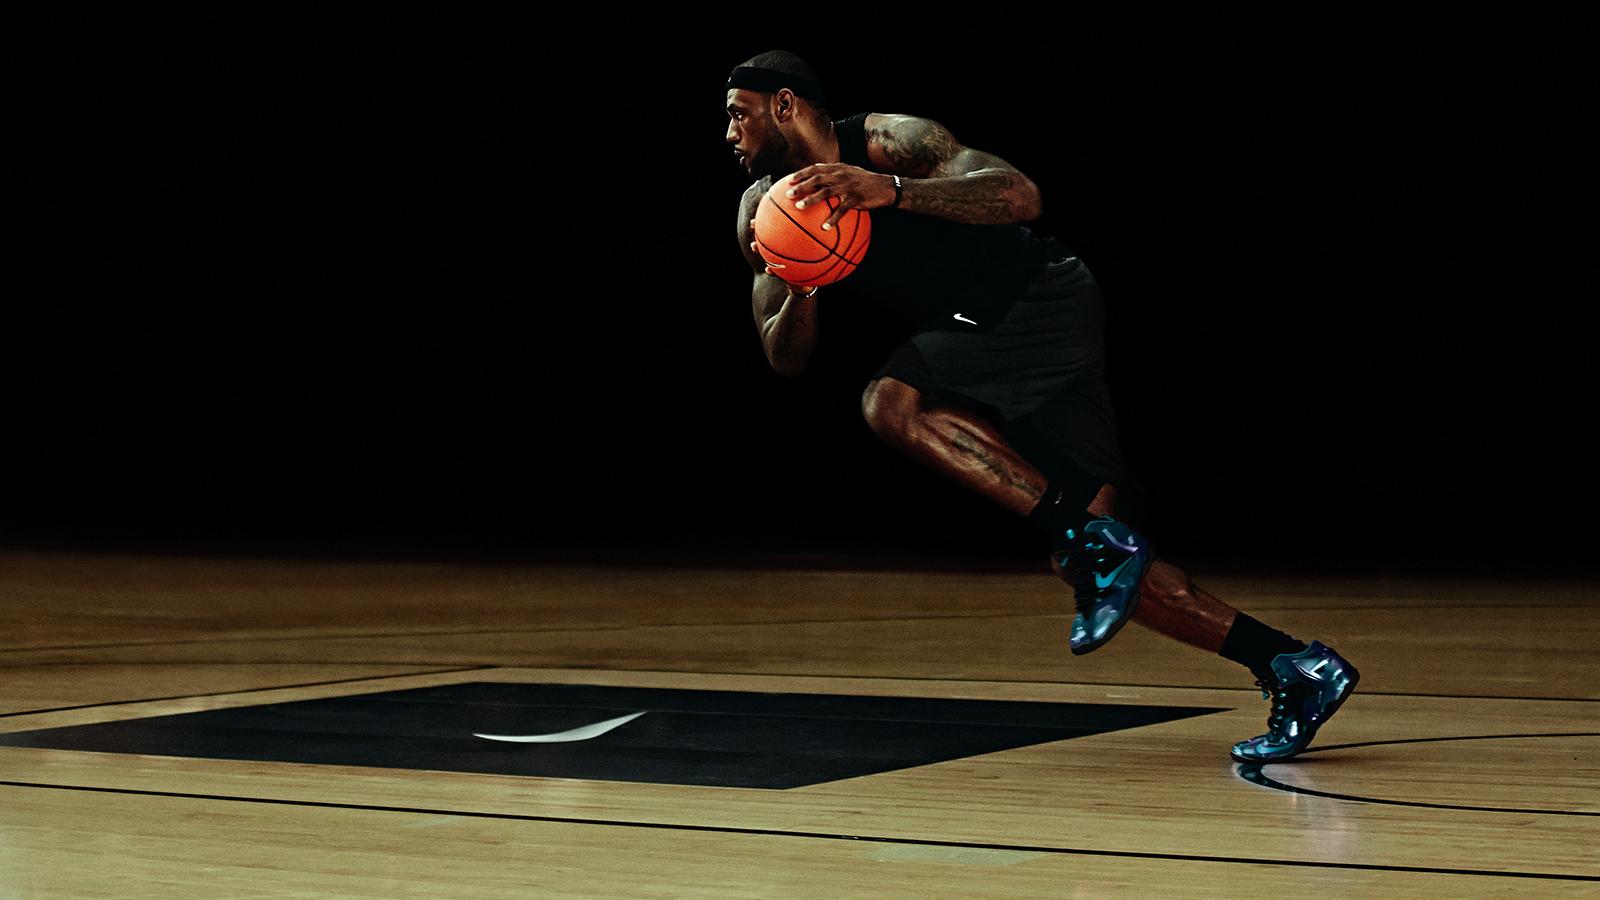 Nike Shoes Wallpaper Hd Wallpaper Desktop Hd